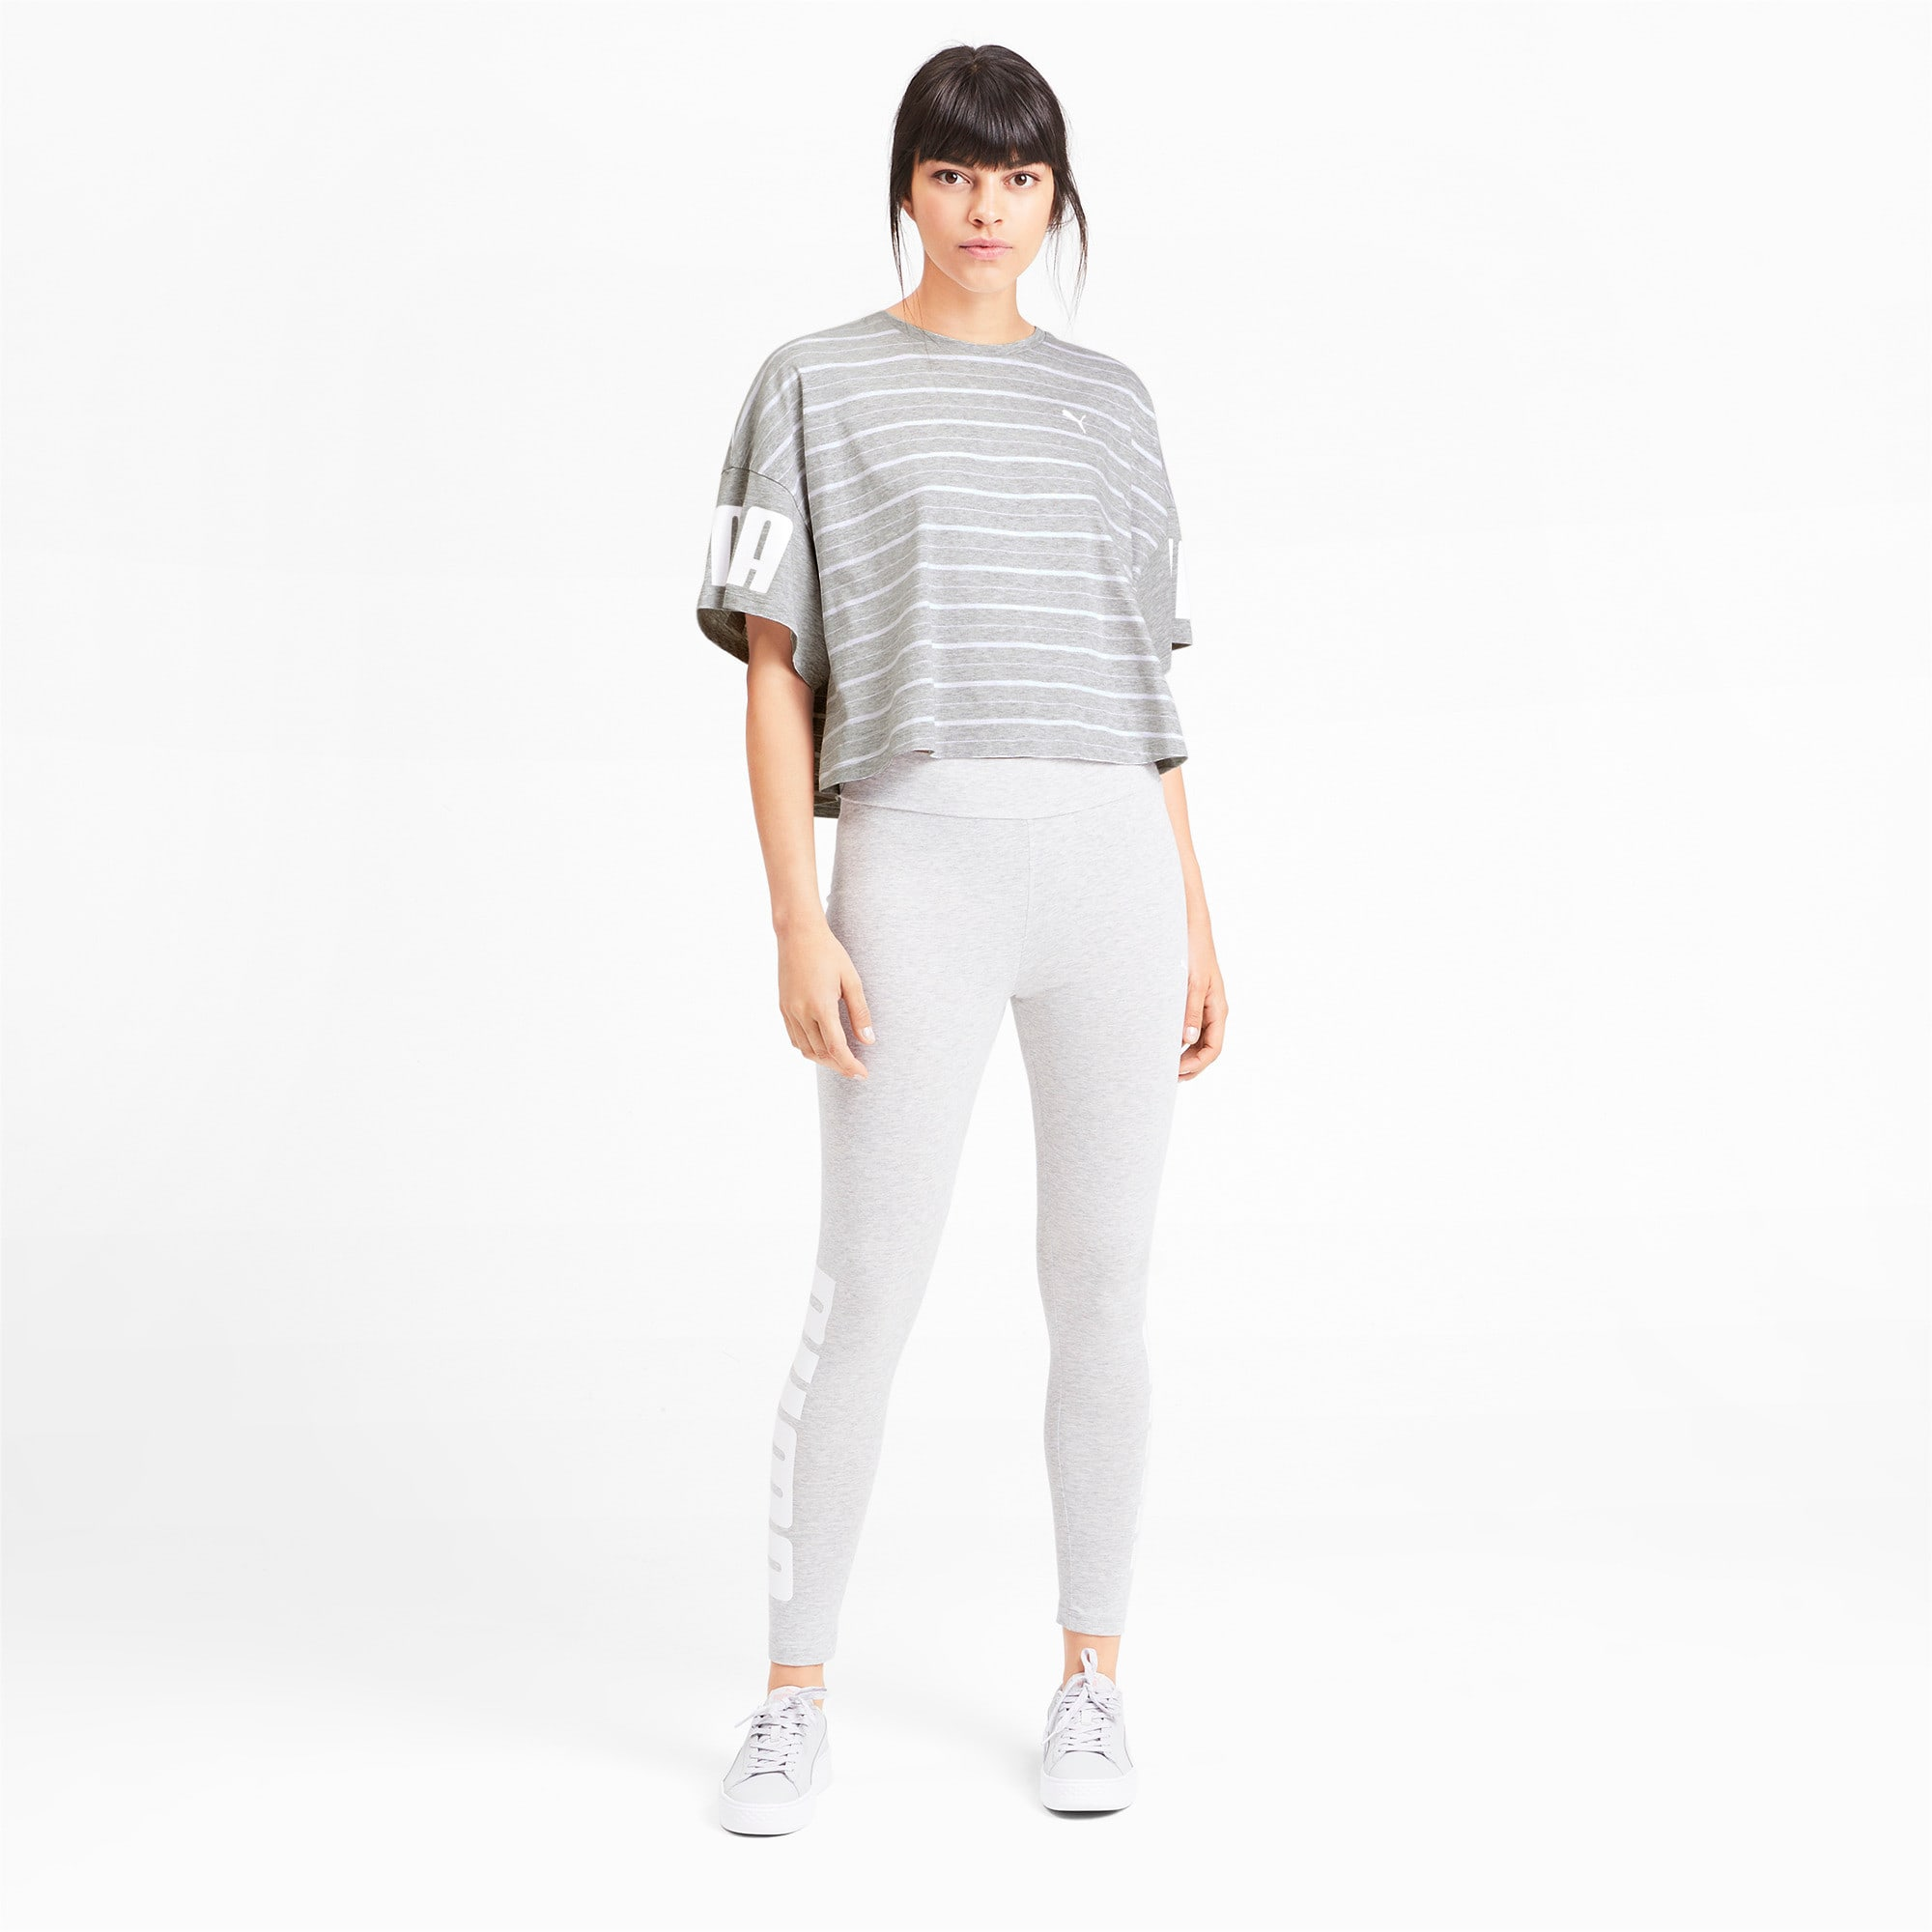 Thumbnail 4 of Rebel Striped Short Sleeve Women's Tee, Light Gray Heather, medium-IND